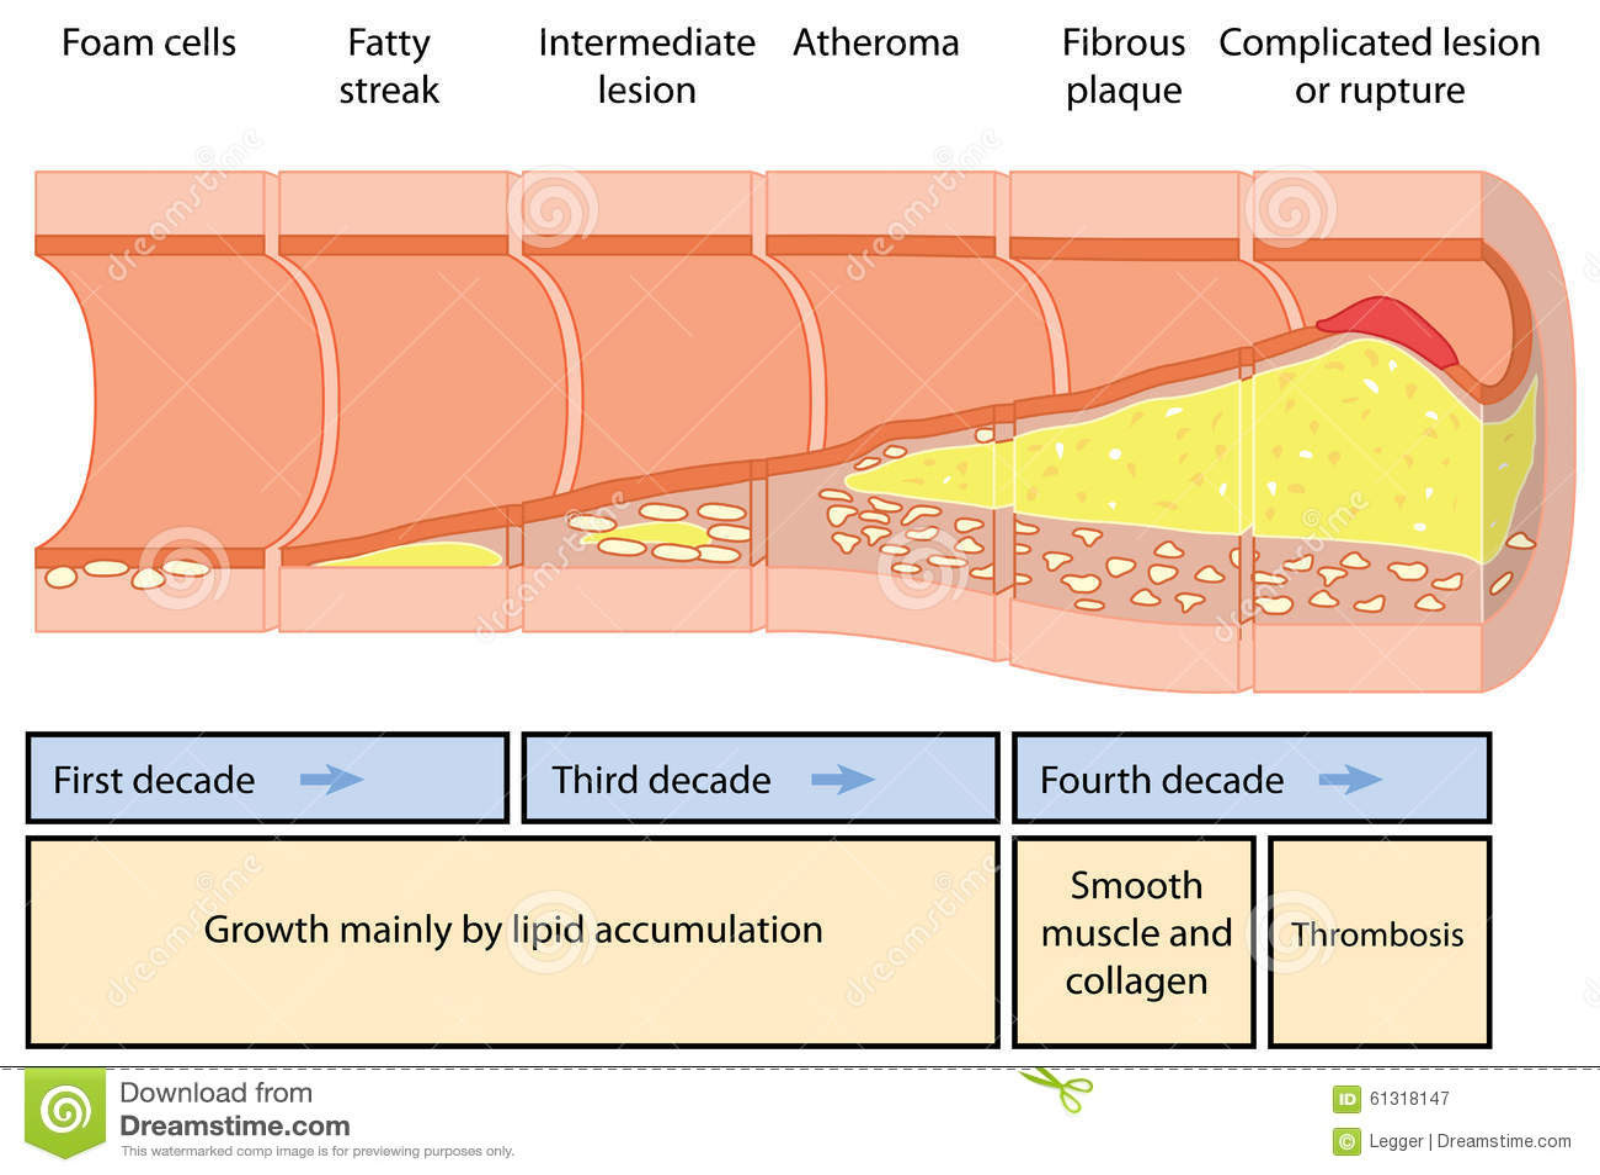 atheroma formation development atheromatous plaque artery over four decades created adobe illustrator eps 61318147